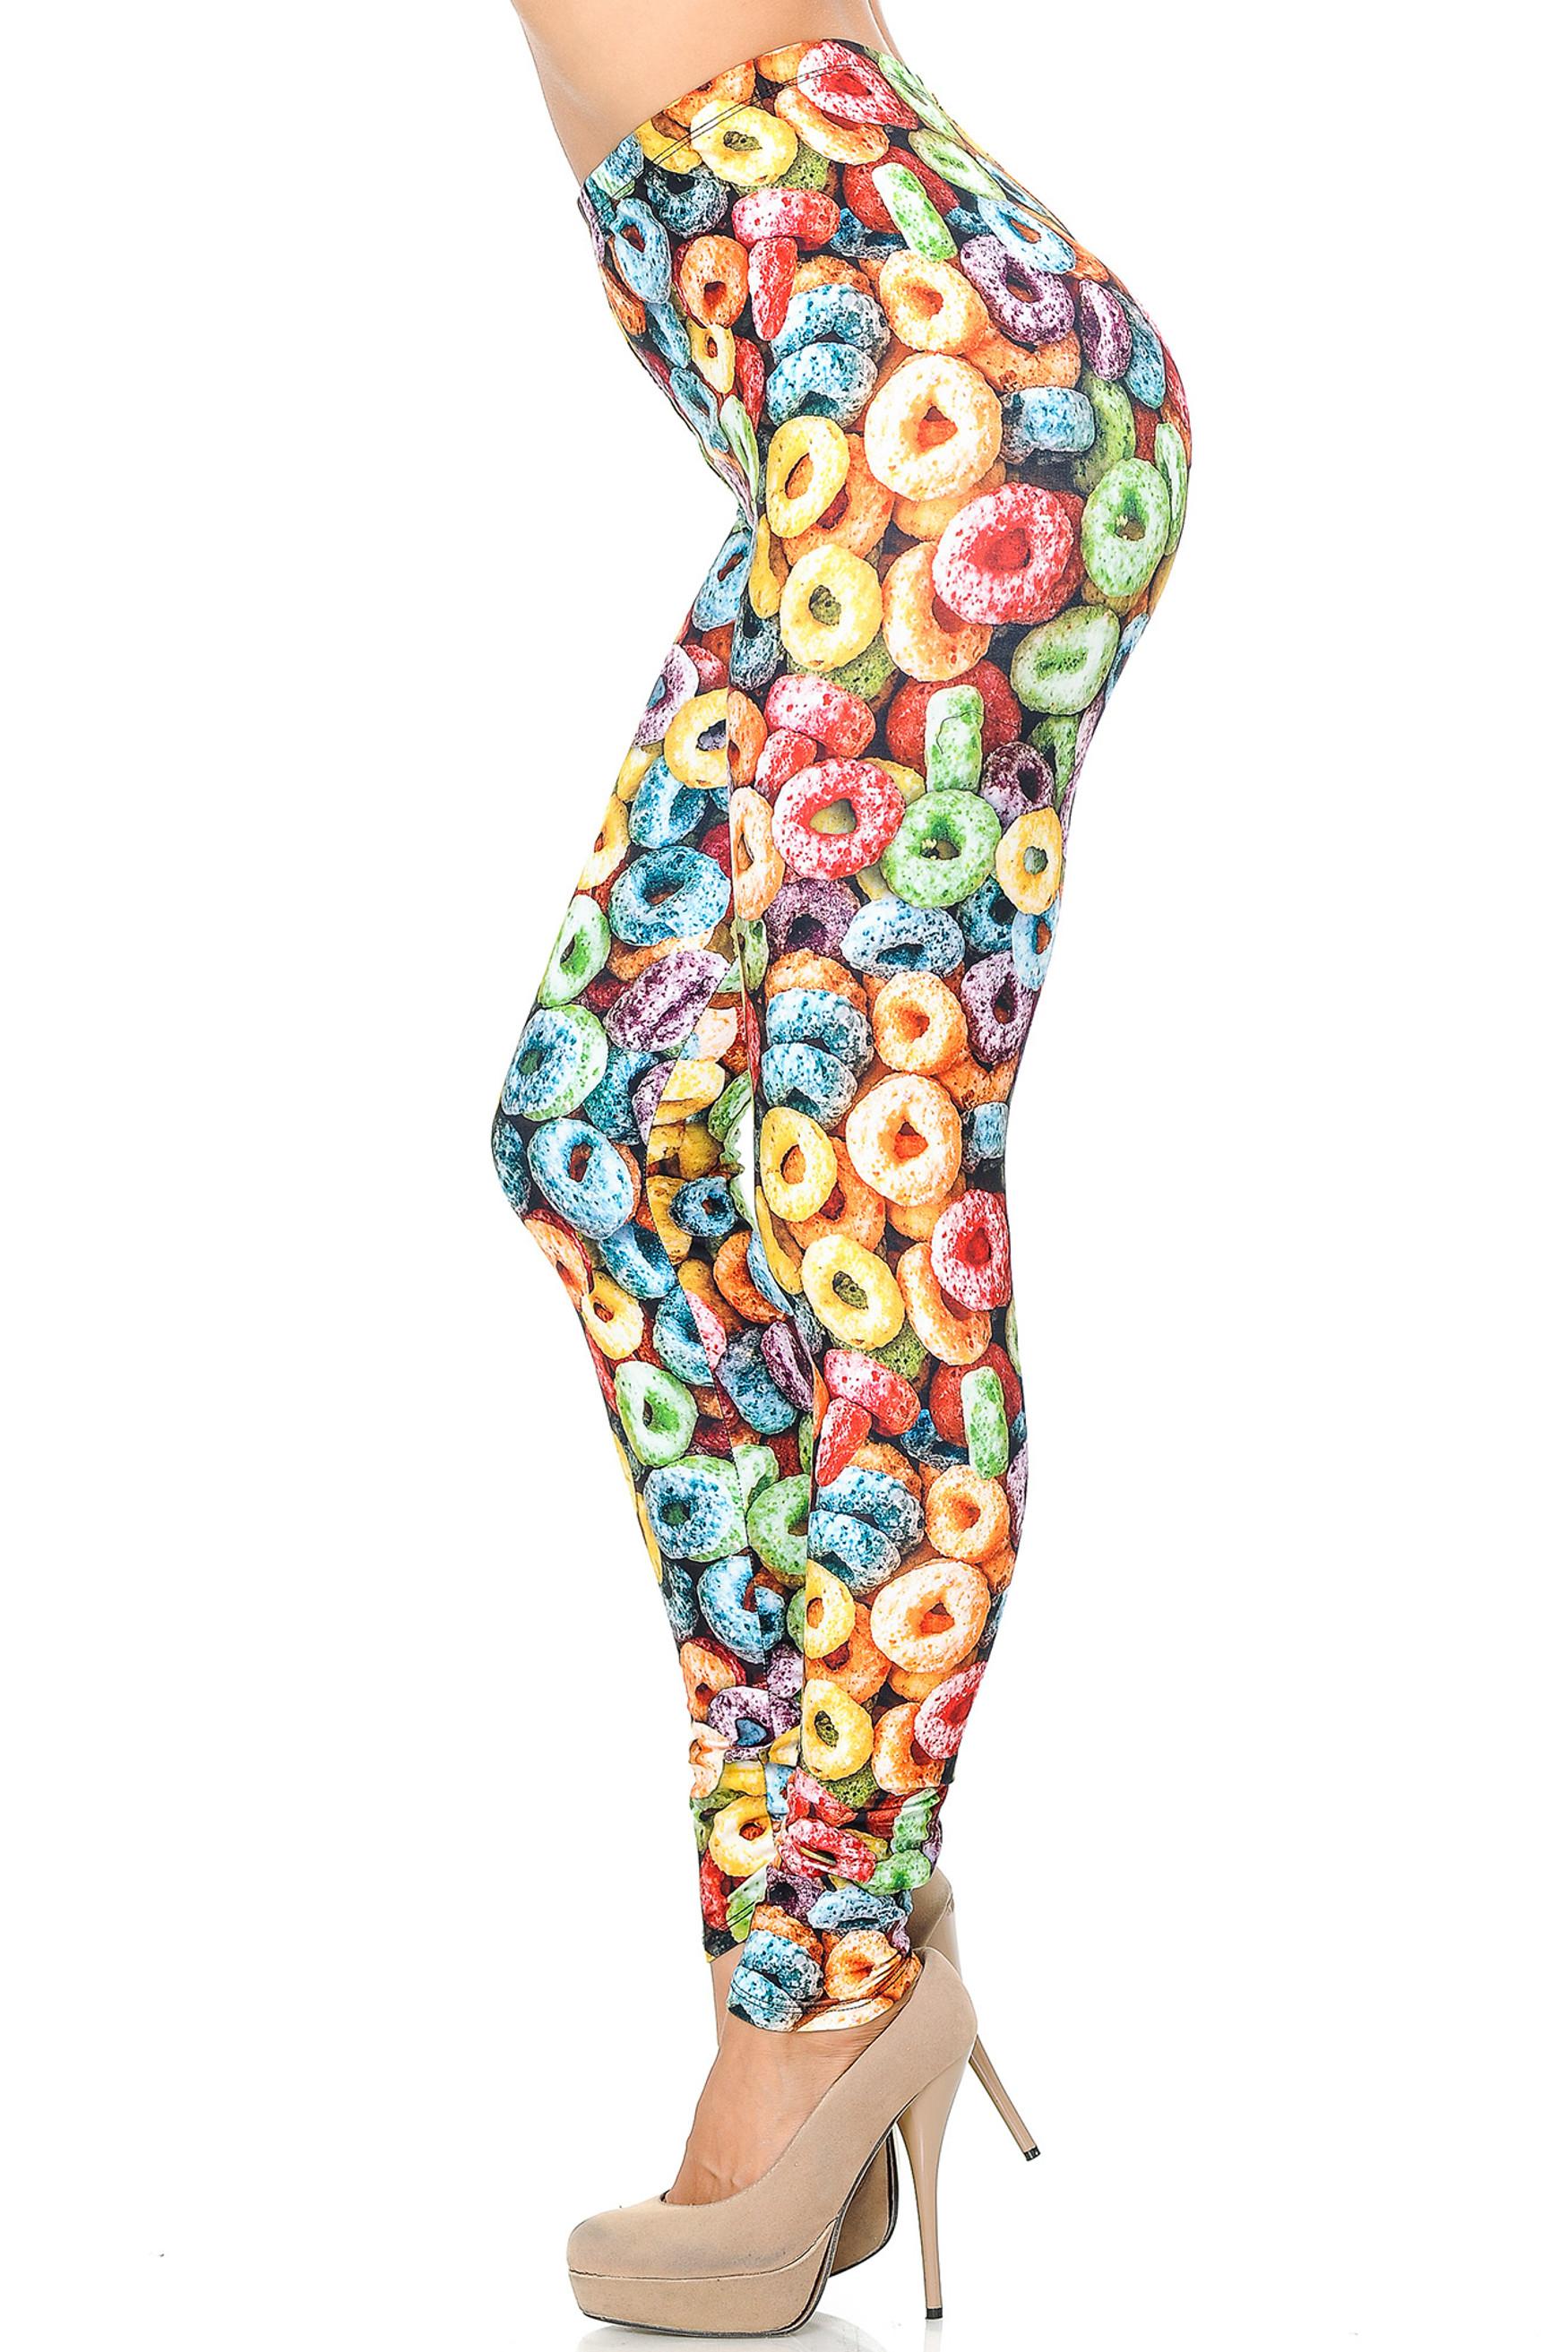 Creamy Soft Colorful Cereal Loops Leggings - USA Fashion™